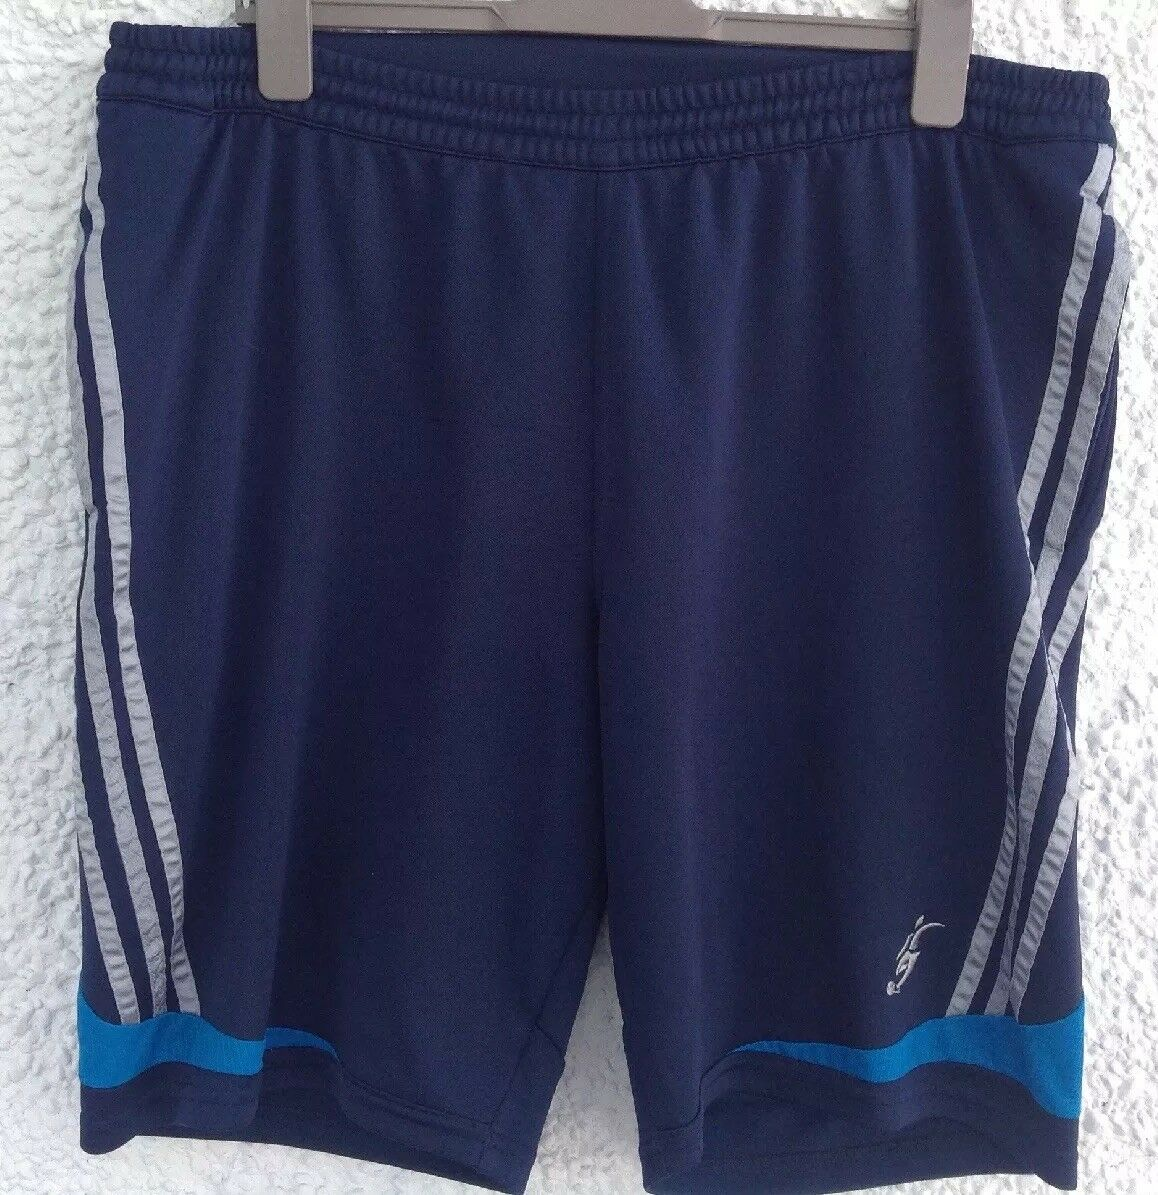 Adidas bleu marine XL Extra Large Homme Short Homme Large Bleu Marine Bleu, Argent Rayures 3 Lions 61db92